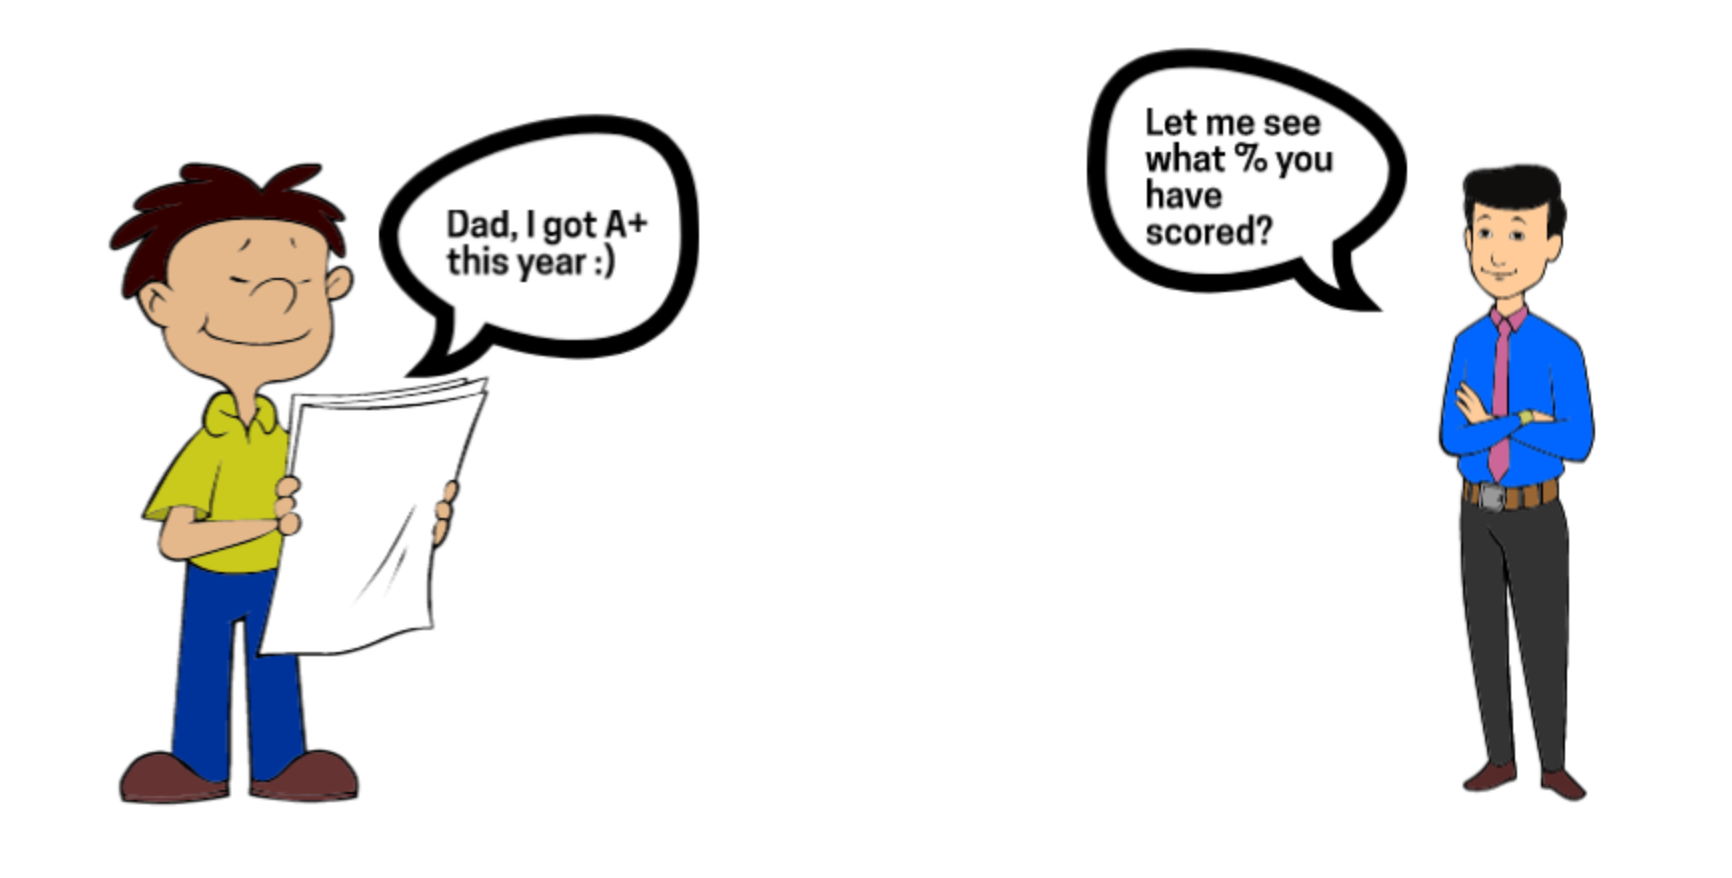 Generation Gap in Scrum